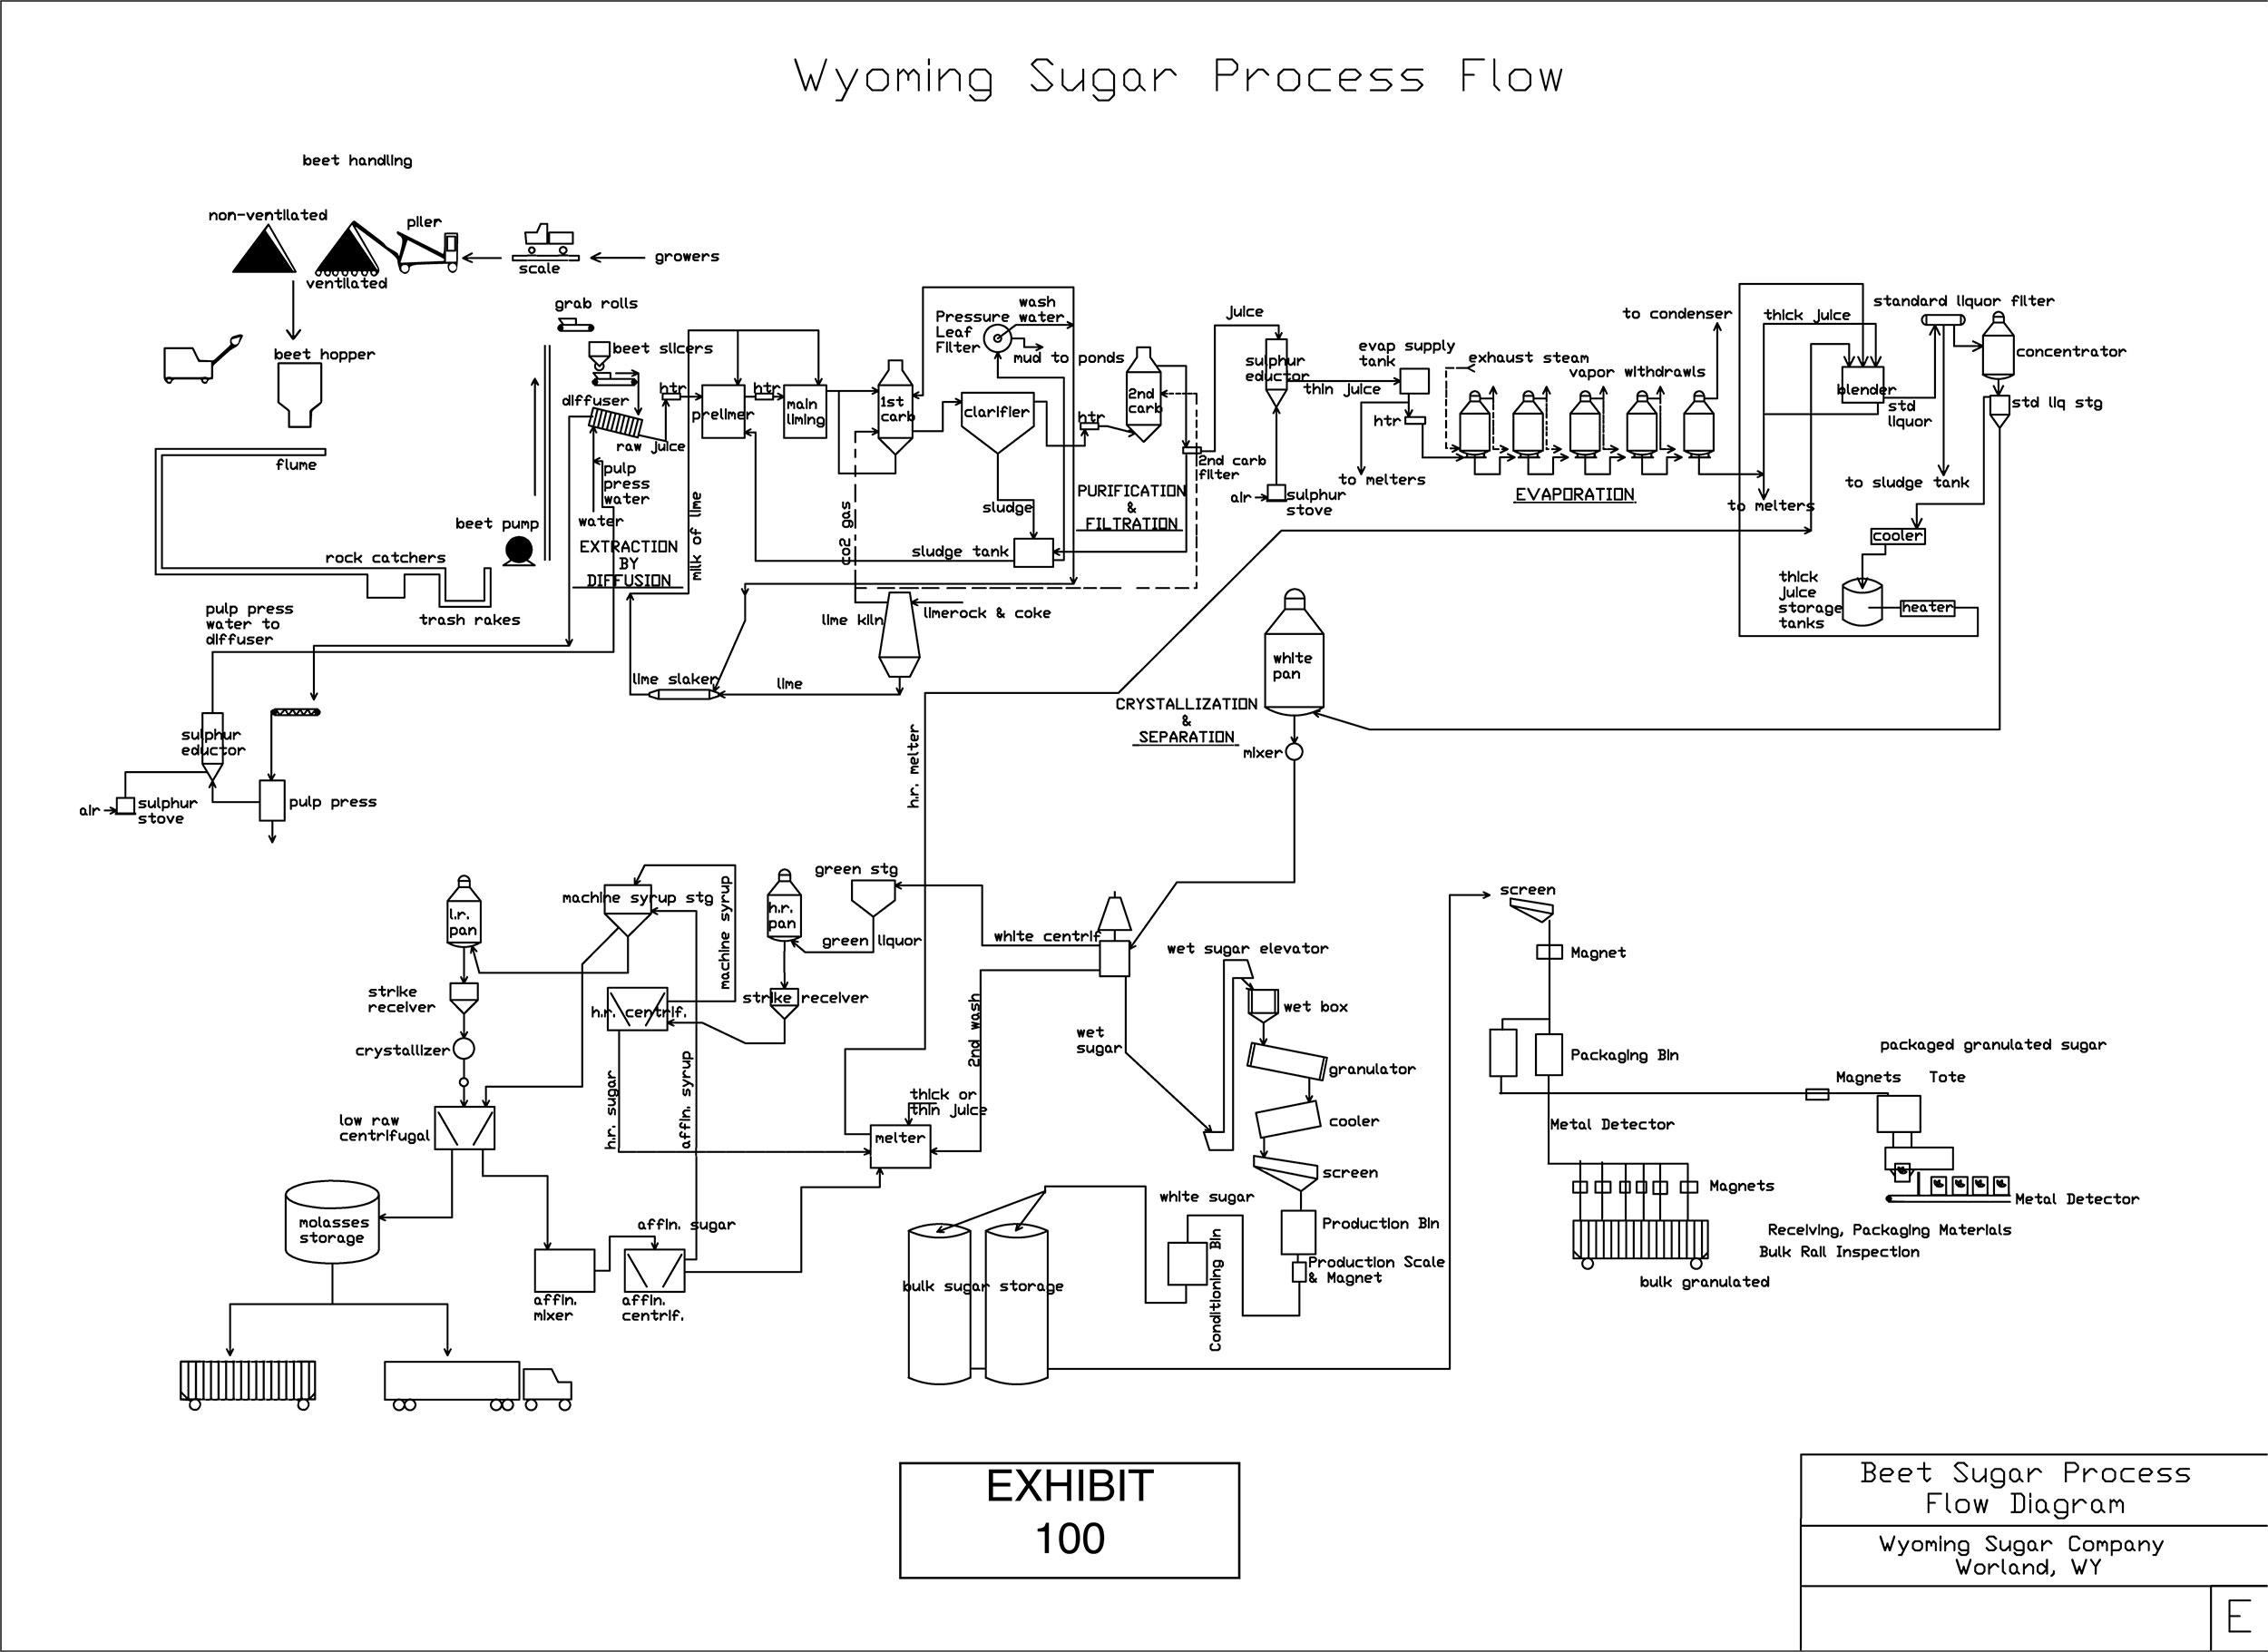 Process Flow Diagram Wyoming Sugar Process Flow Diagram Wyoming Sugar